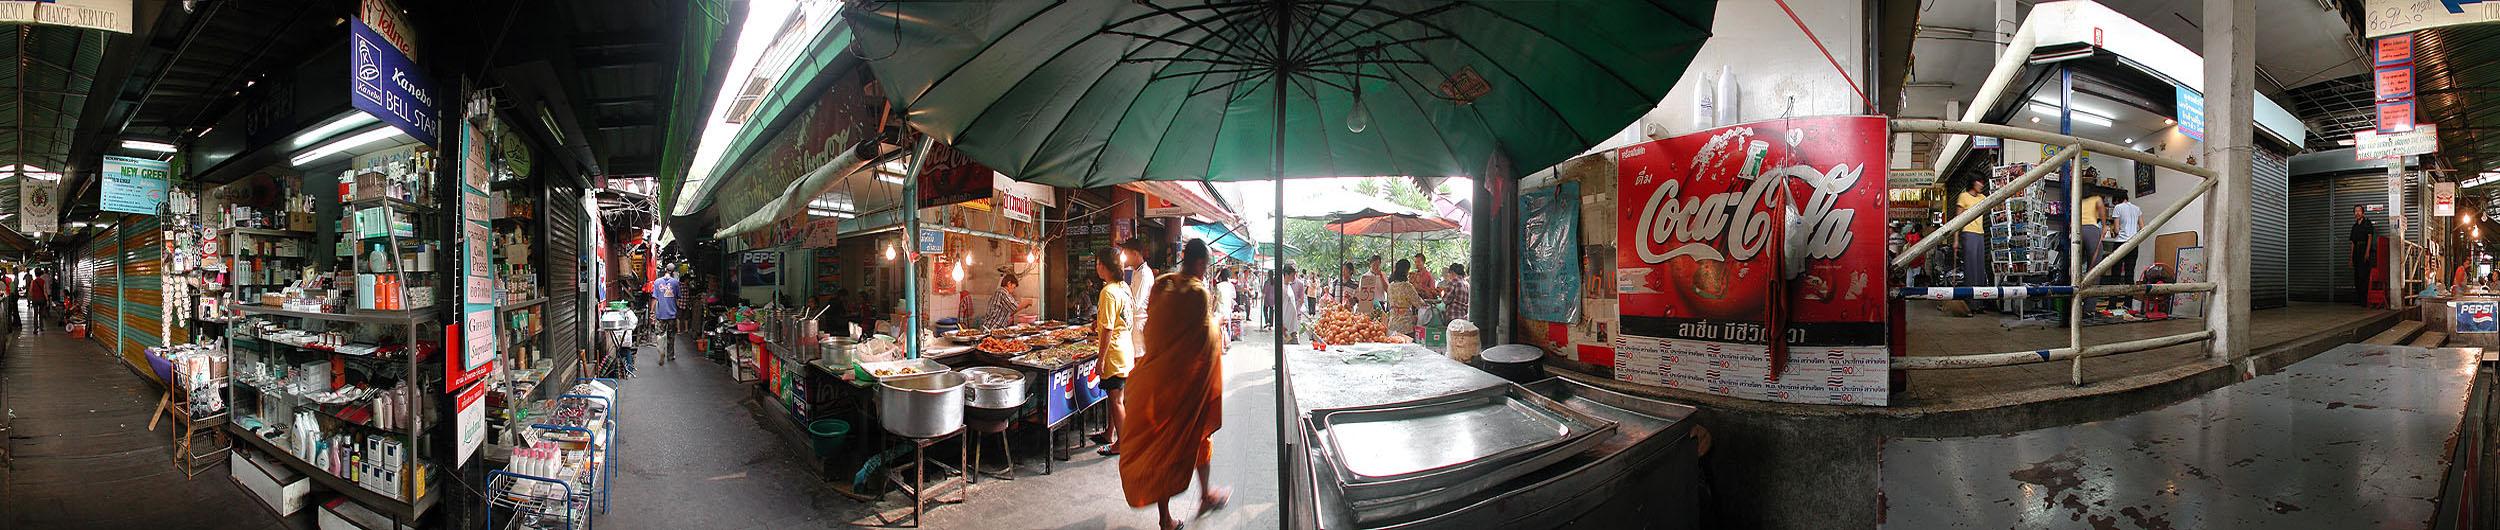 SEA_Bangkok_Food Market.jpg